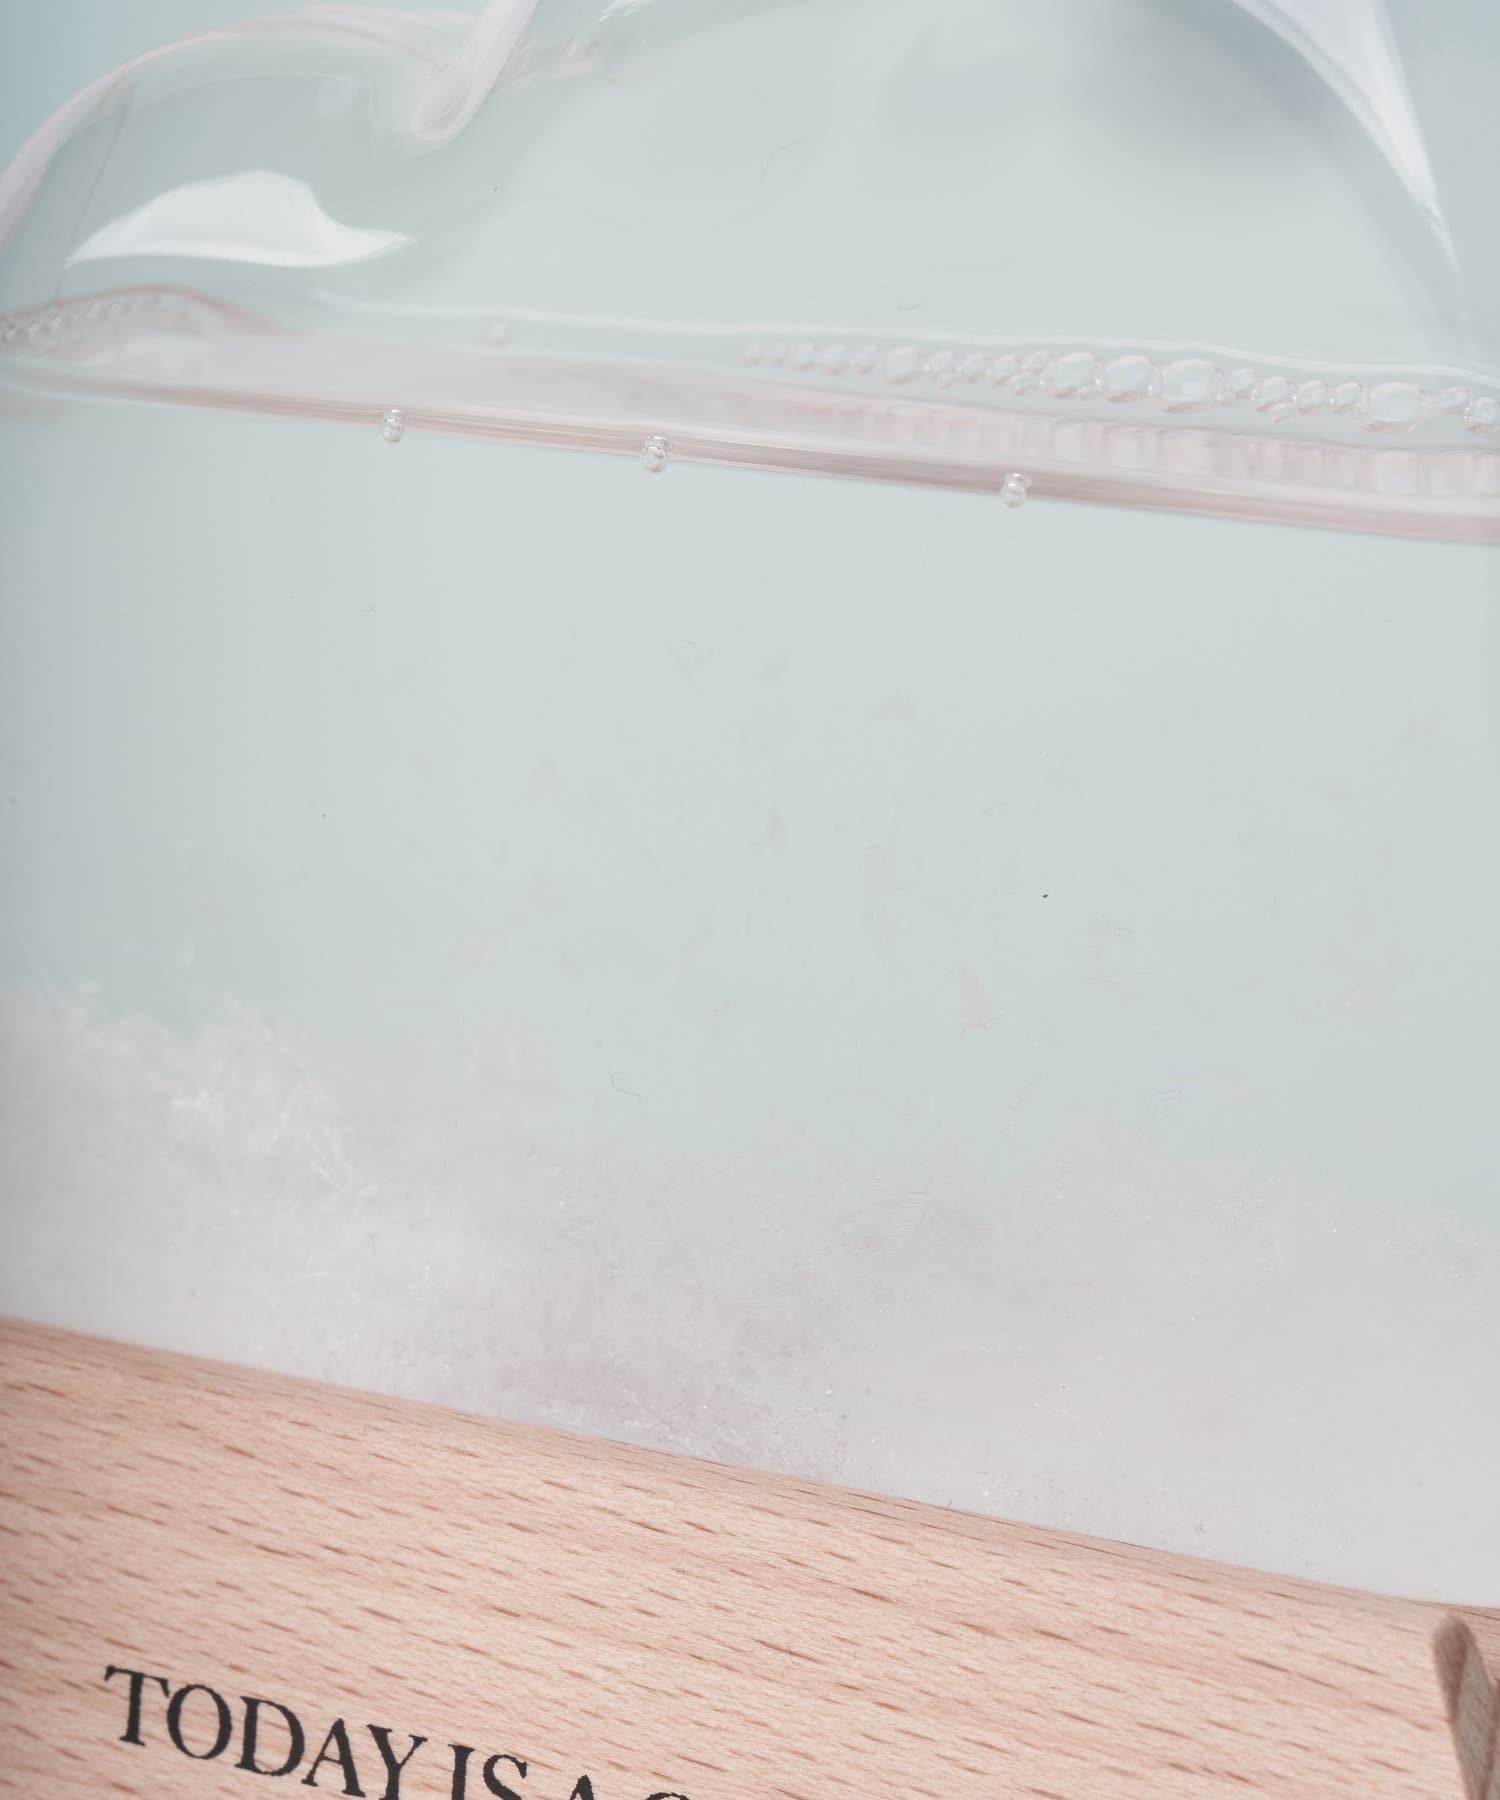 BIRTHDAY BAR(バースデイバー) STORM GLASS CLOUD ストームグラスクラウド